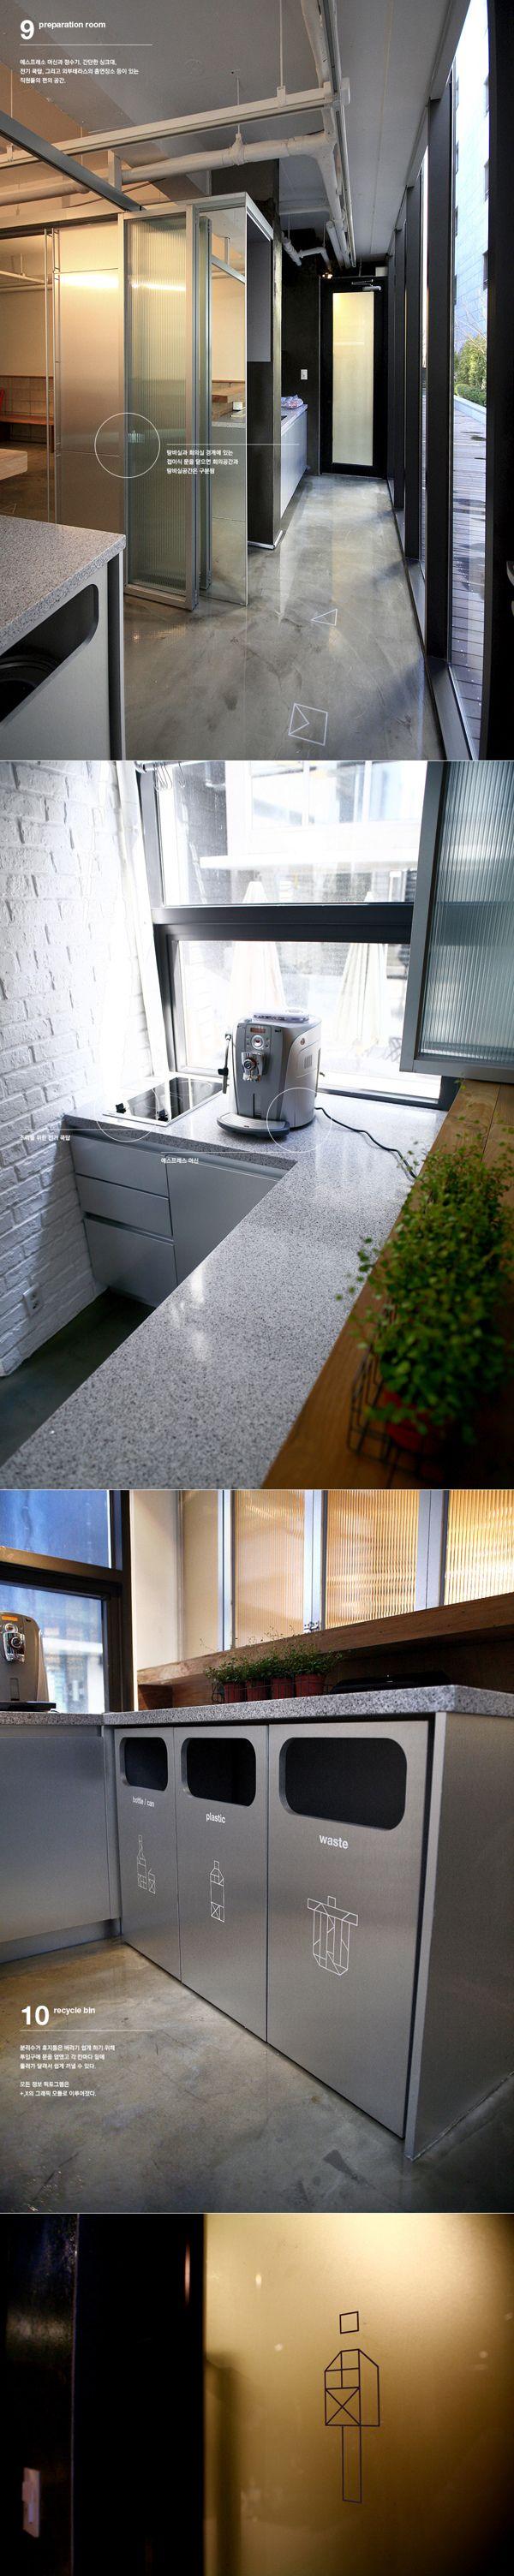 Plus x new office space design by plus x via behance